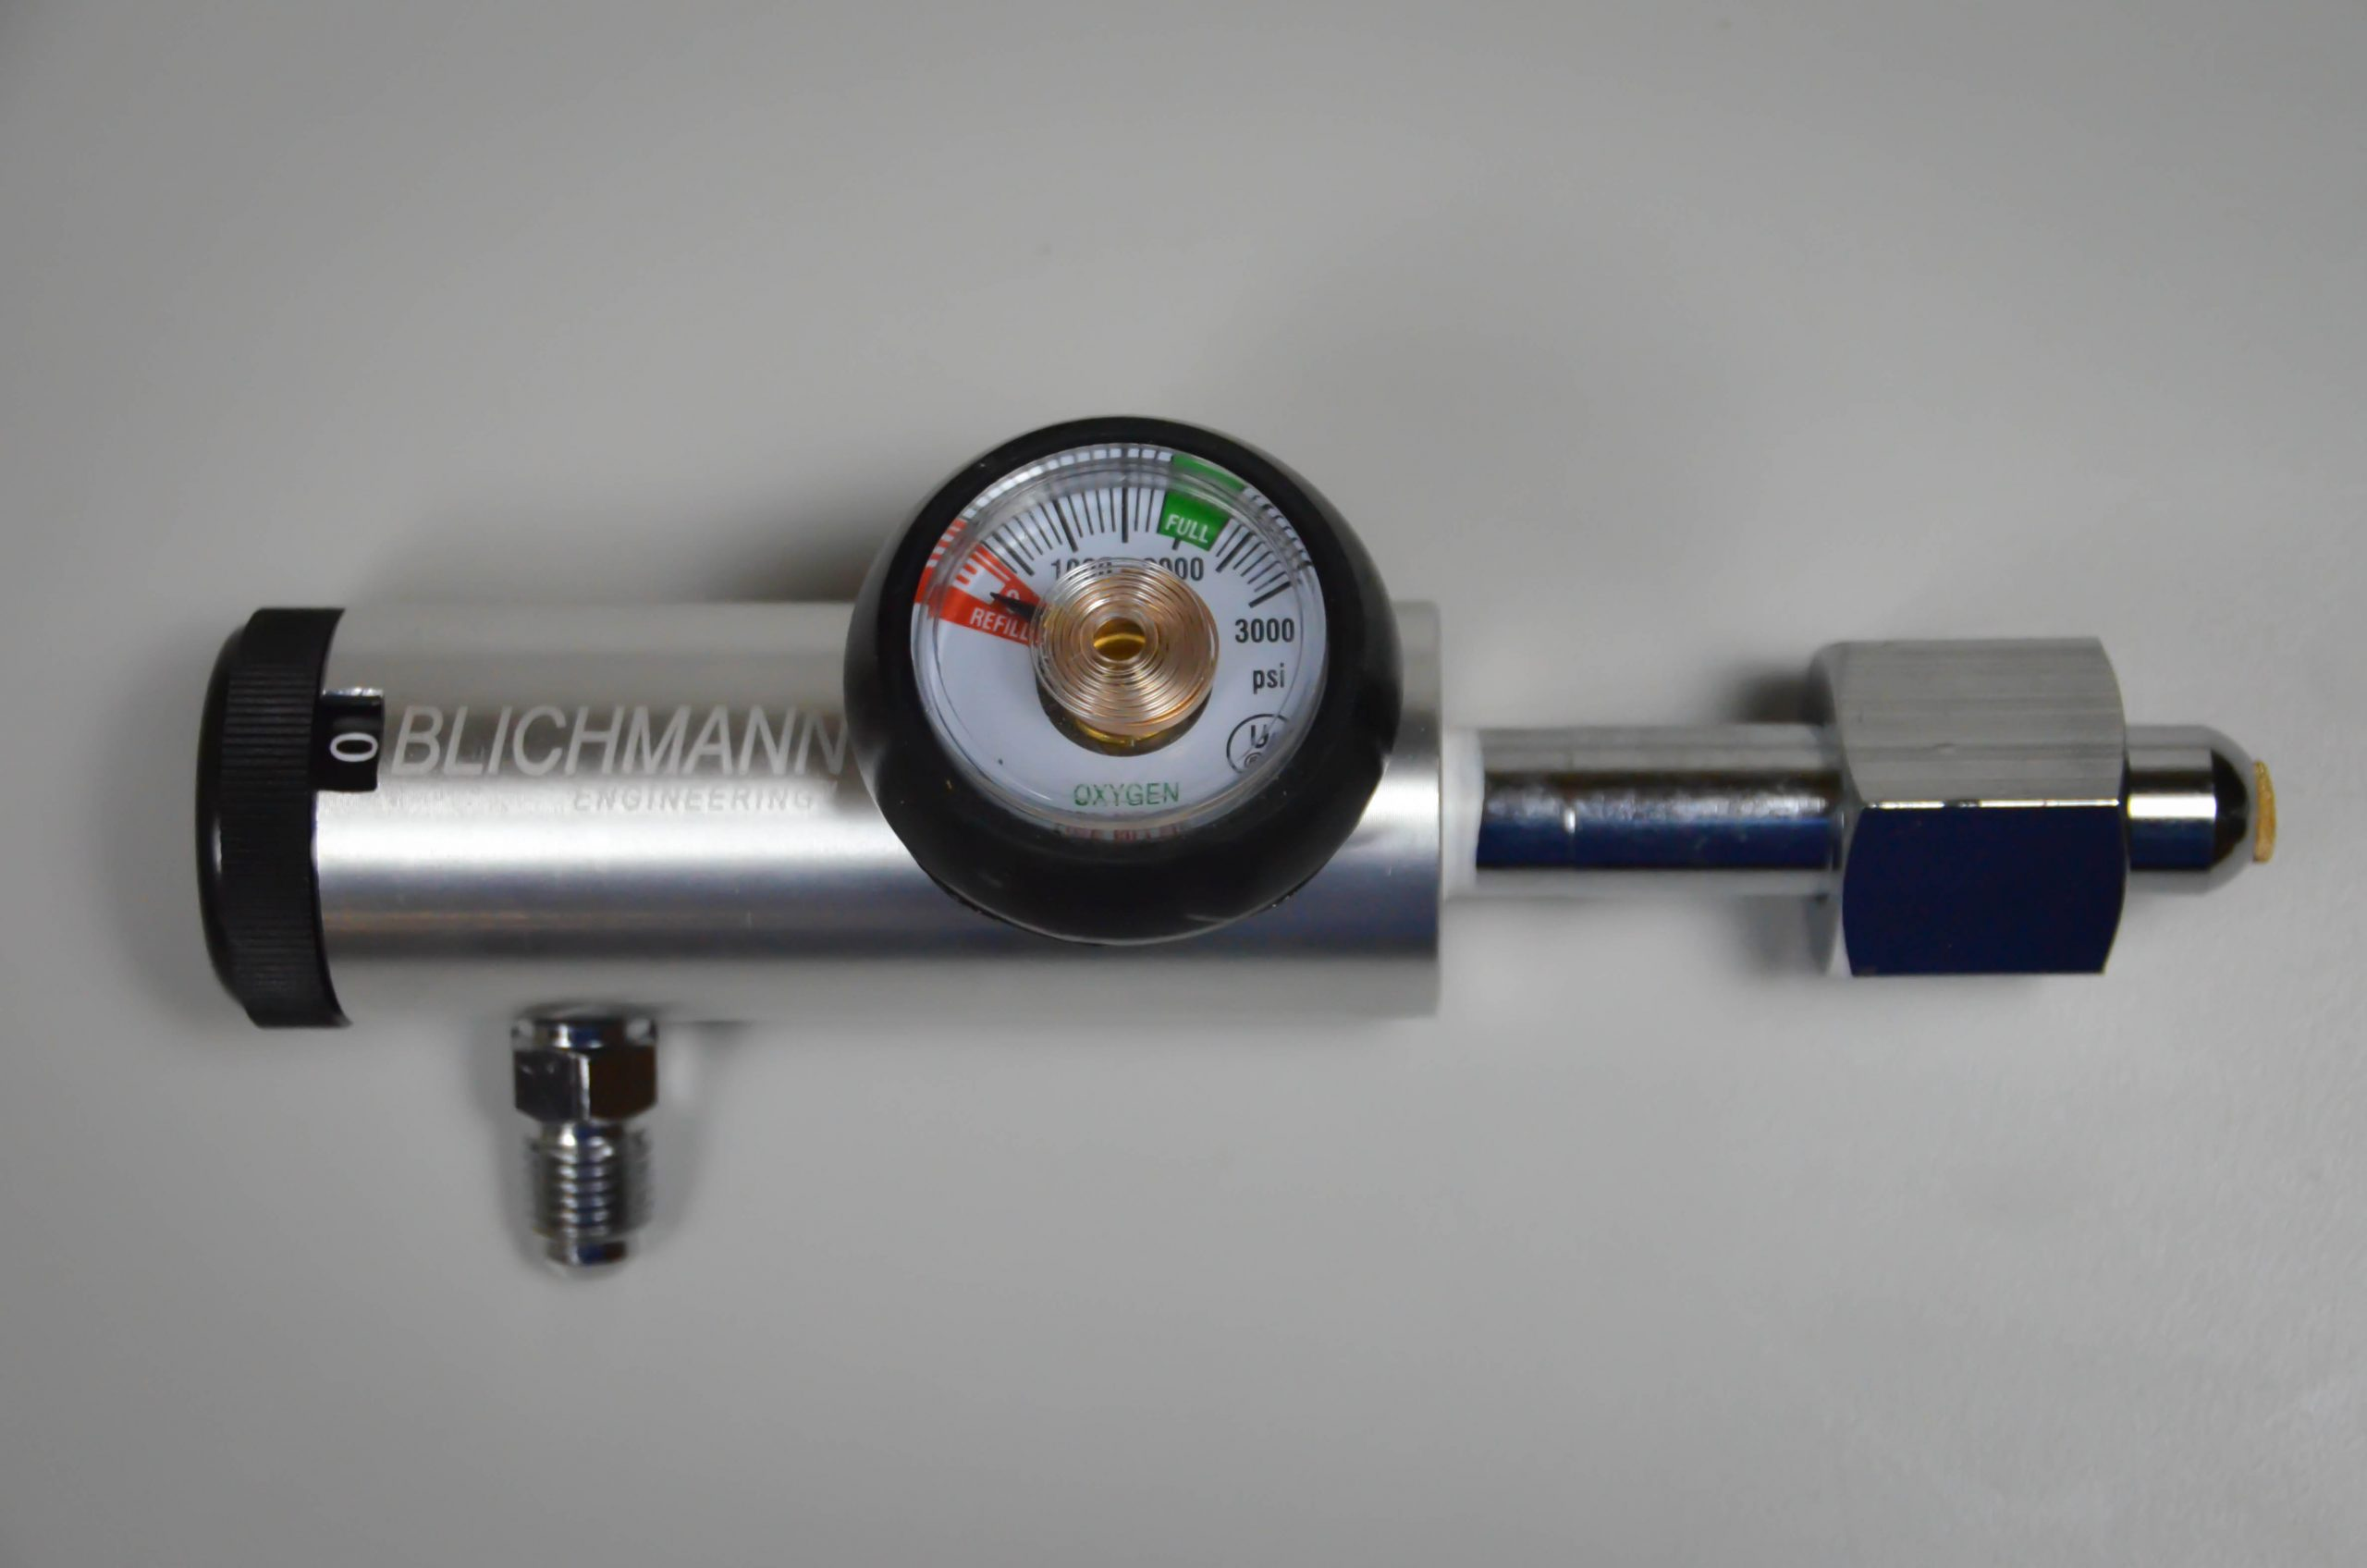 Blichmann In-line:O2 Regulator Premium (1)